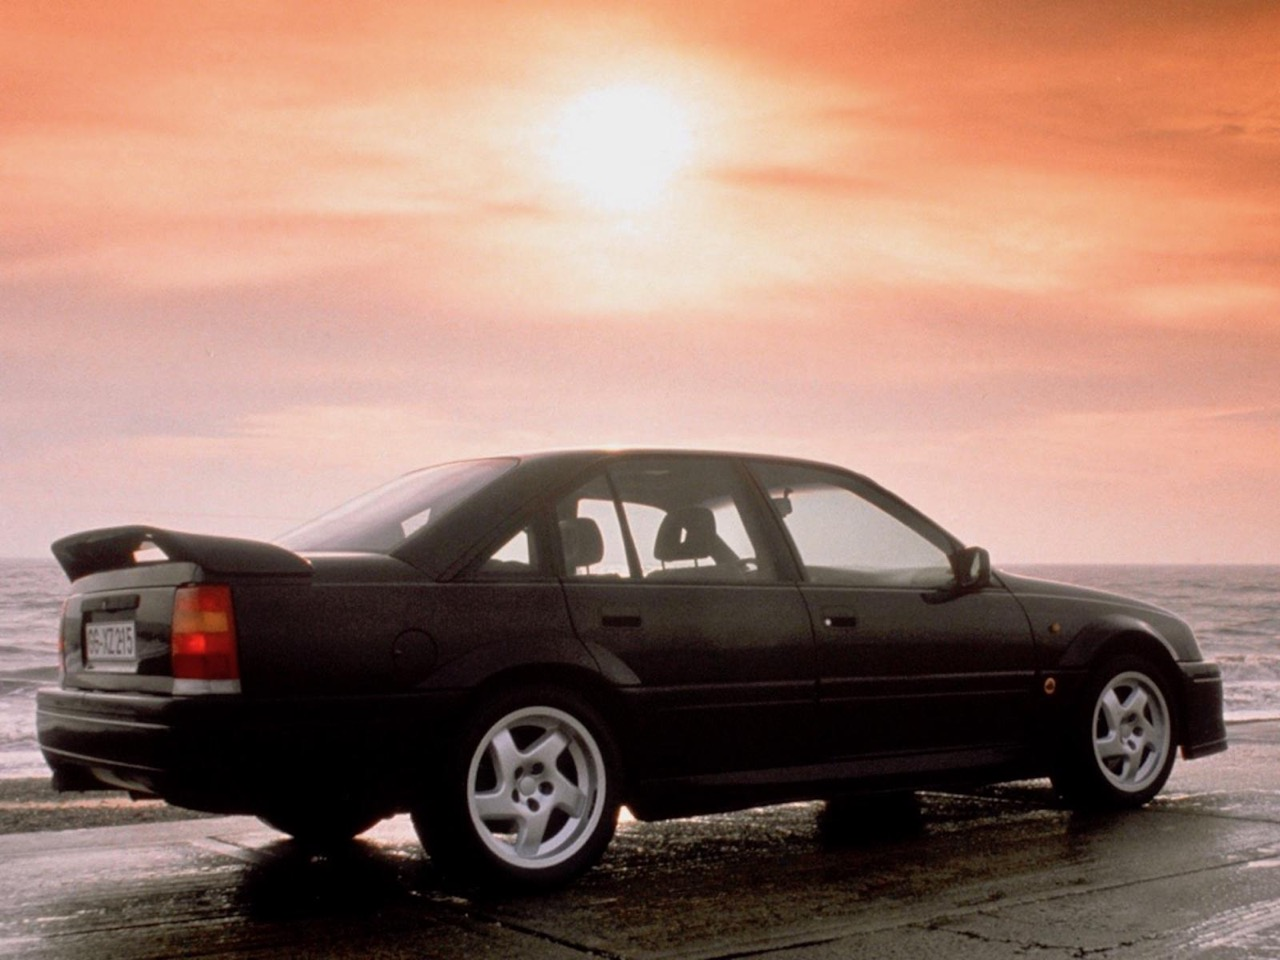 Opel Omega Lotus - Le monstre des 90's ! 54